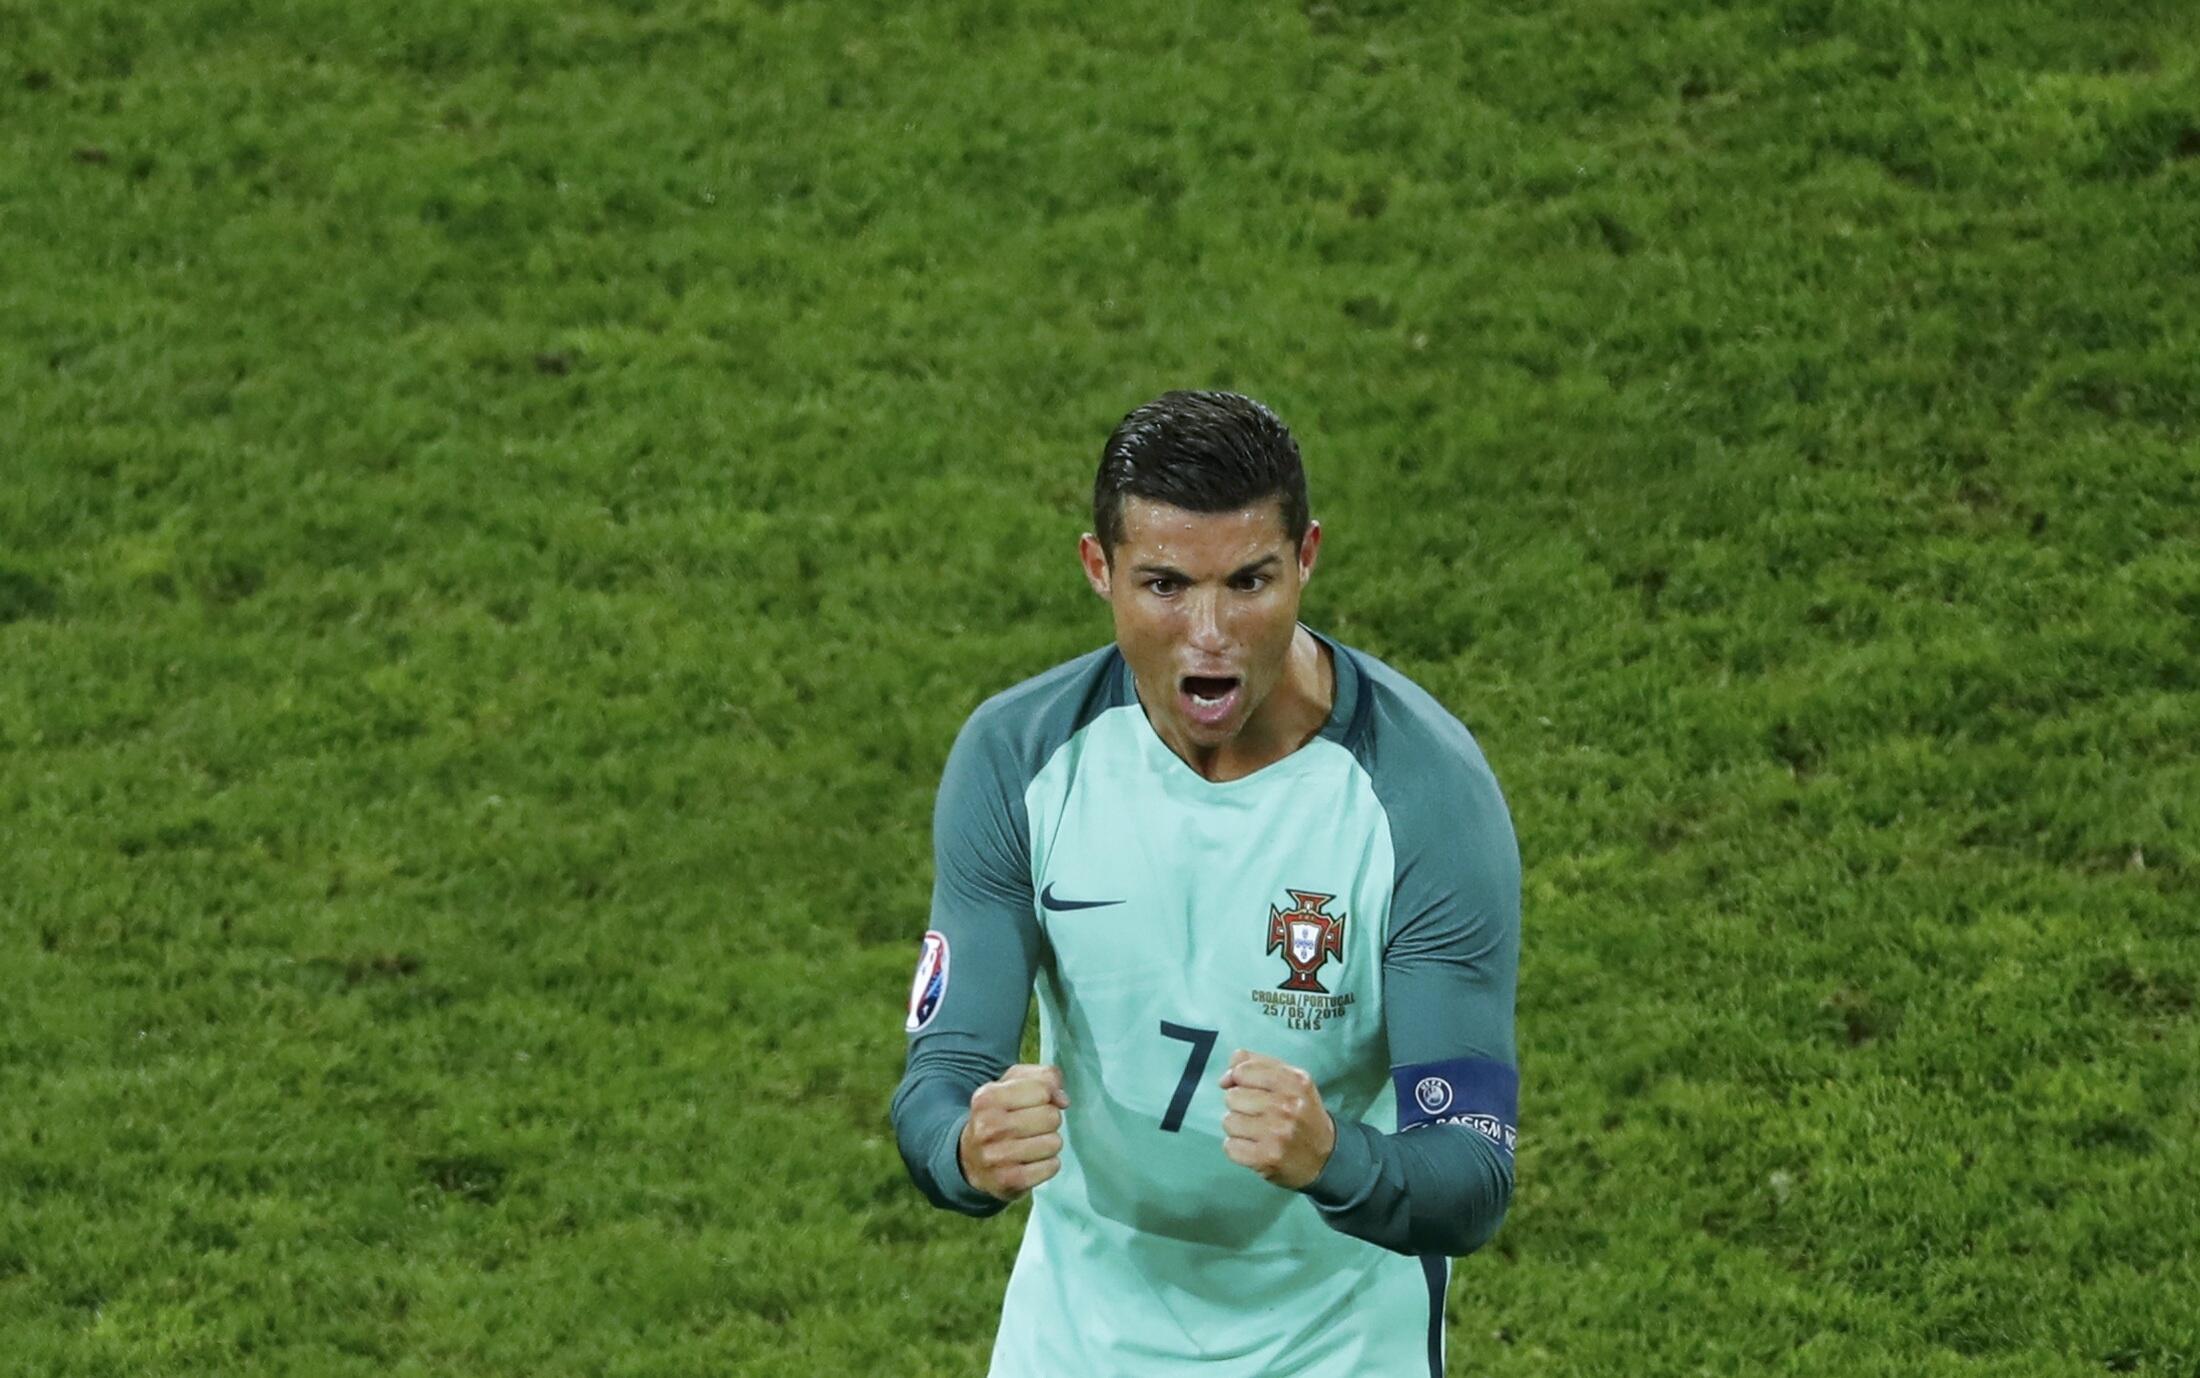 Mchezaji wa Ureno, Christian Ronaldo.